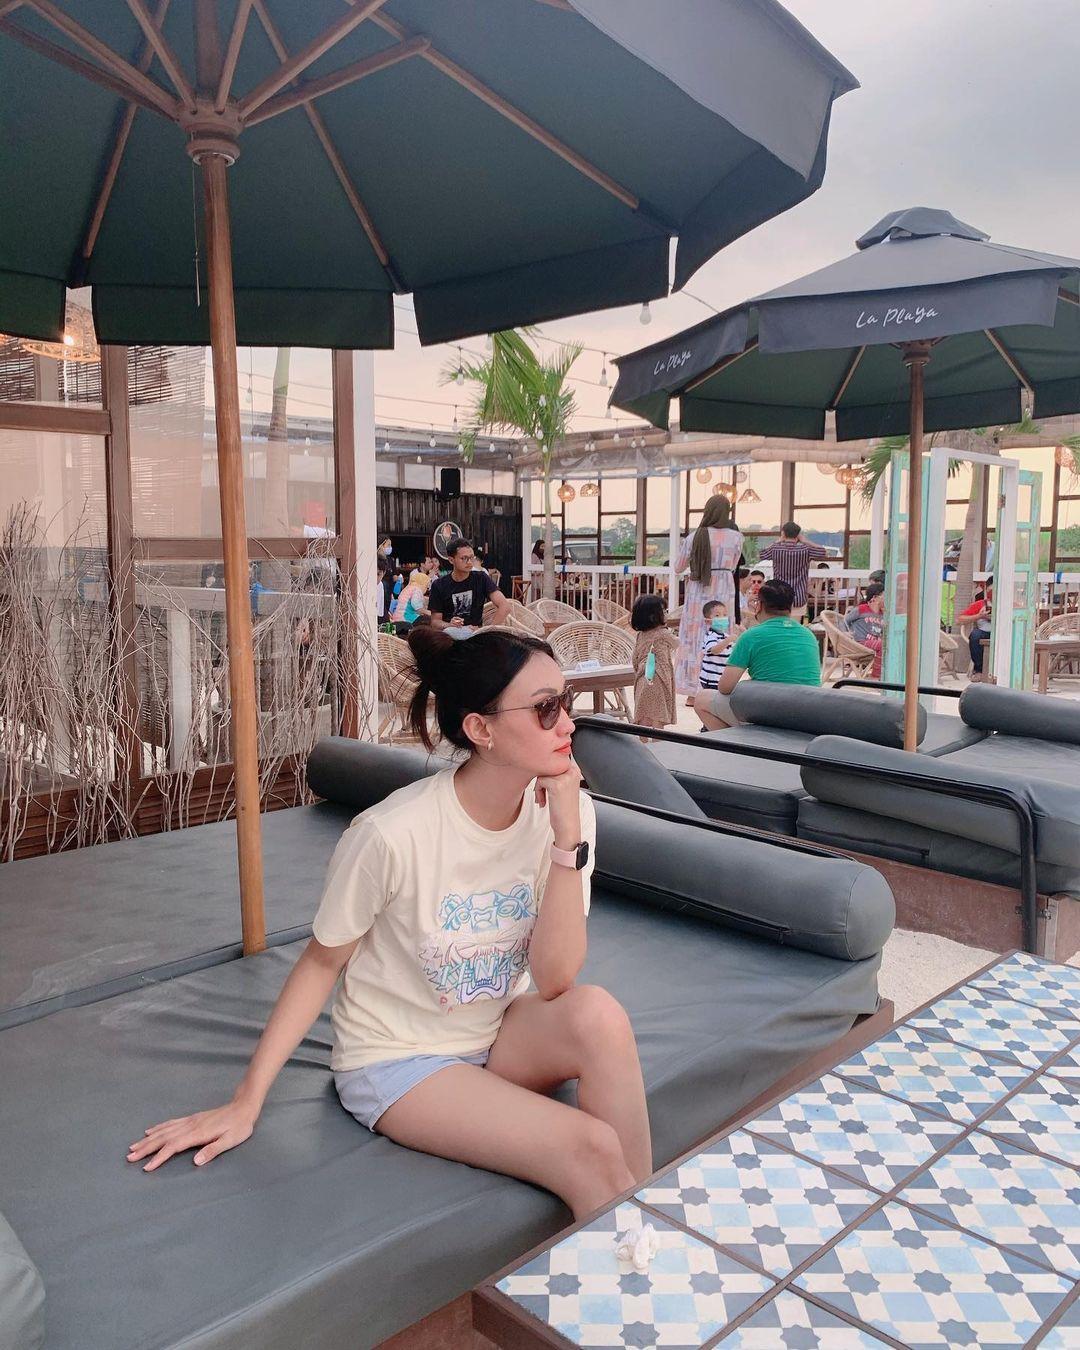 Kasur Di La Playa Cafe Semarang Image From @nindy_pramesty